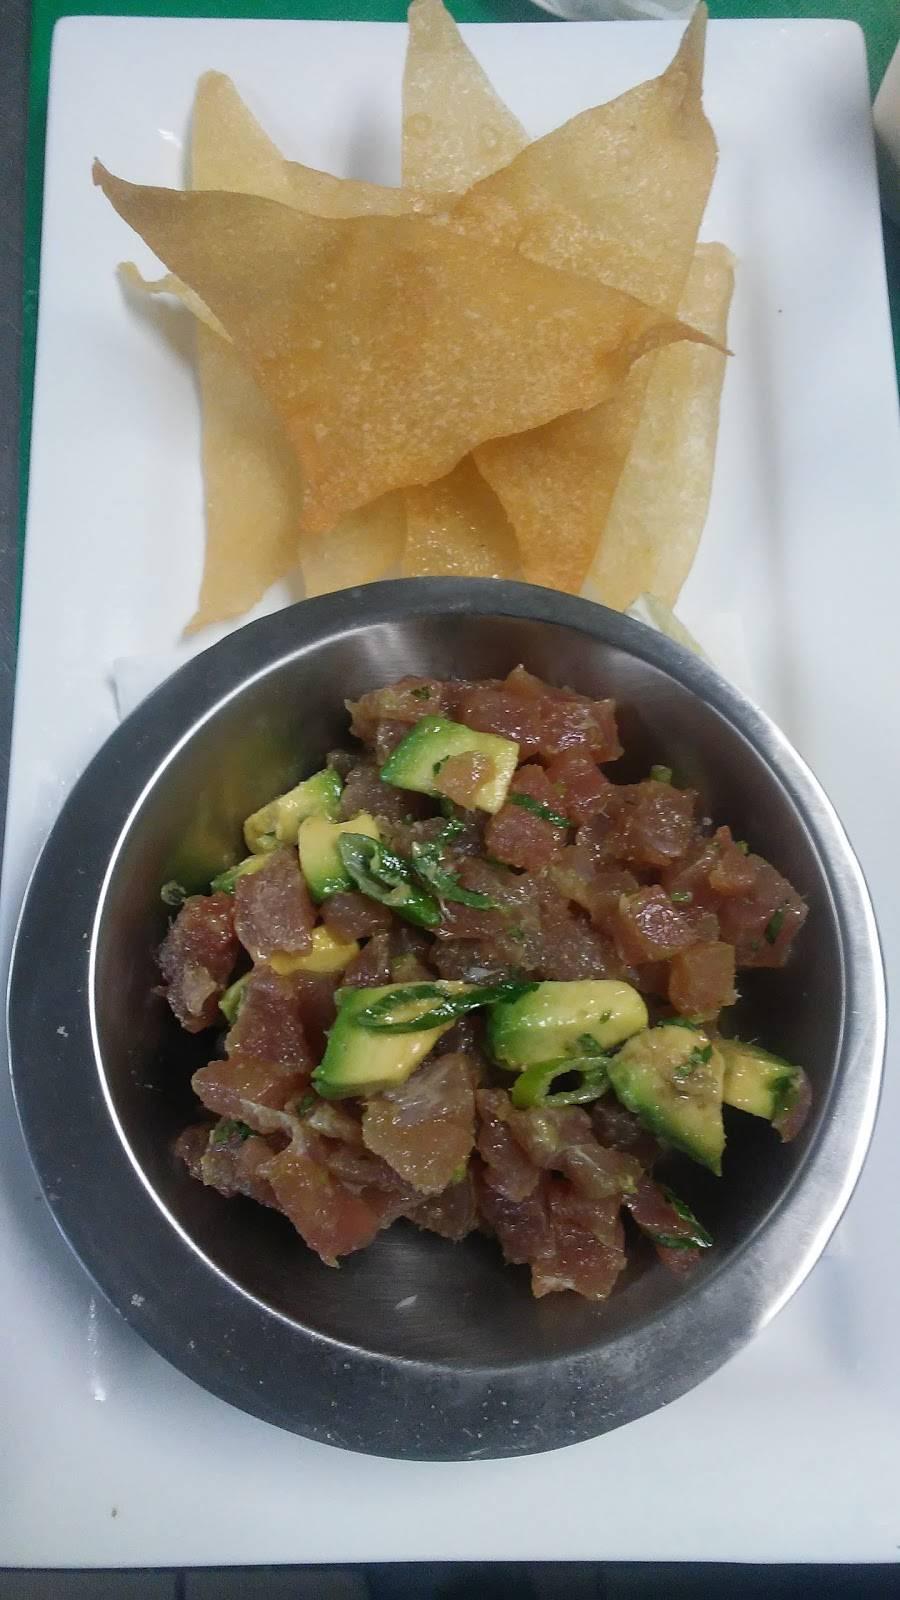 The Primal Cut Steakhouse | restaurant | 17344 Oak Park Ave, Tinley Park, IL 60477, USA | 7084078150 OR +1 708-407-8150